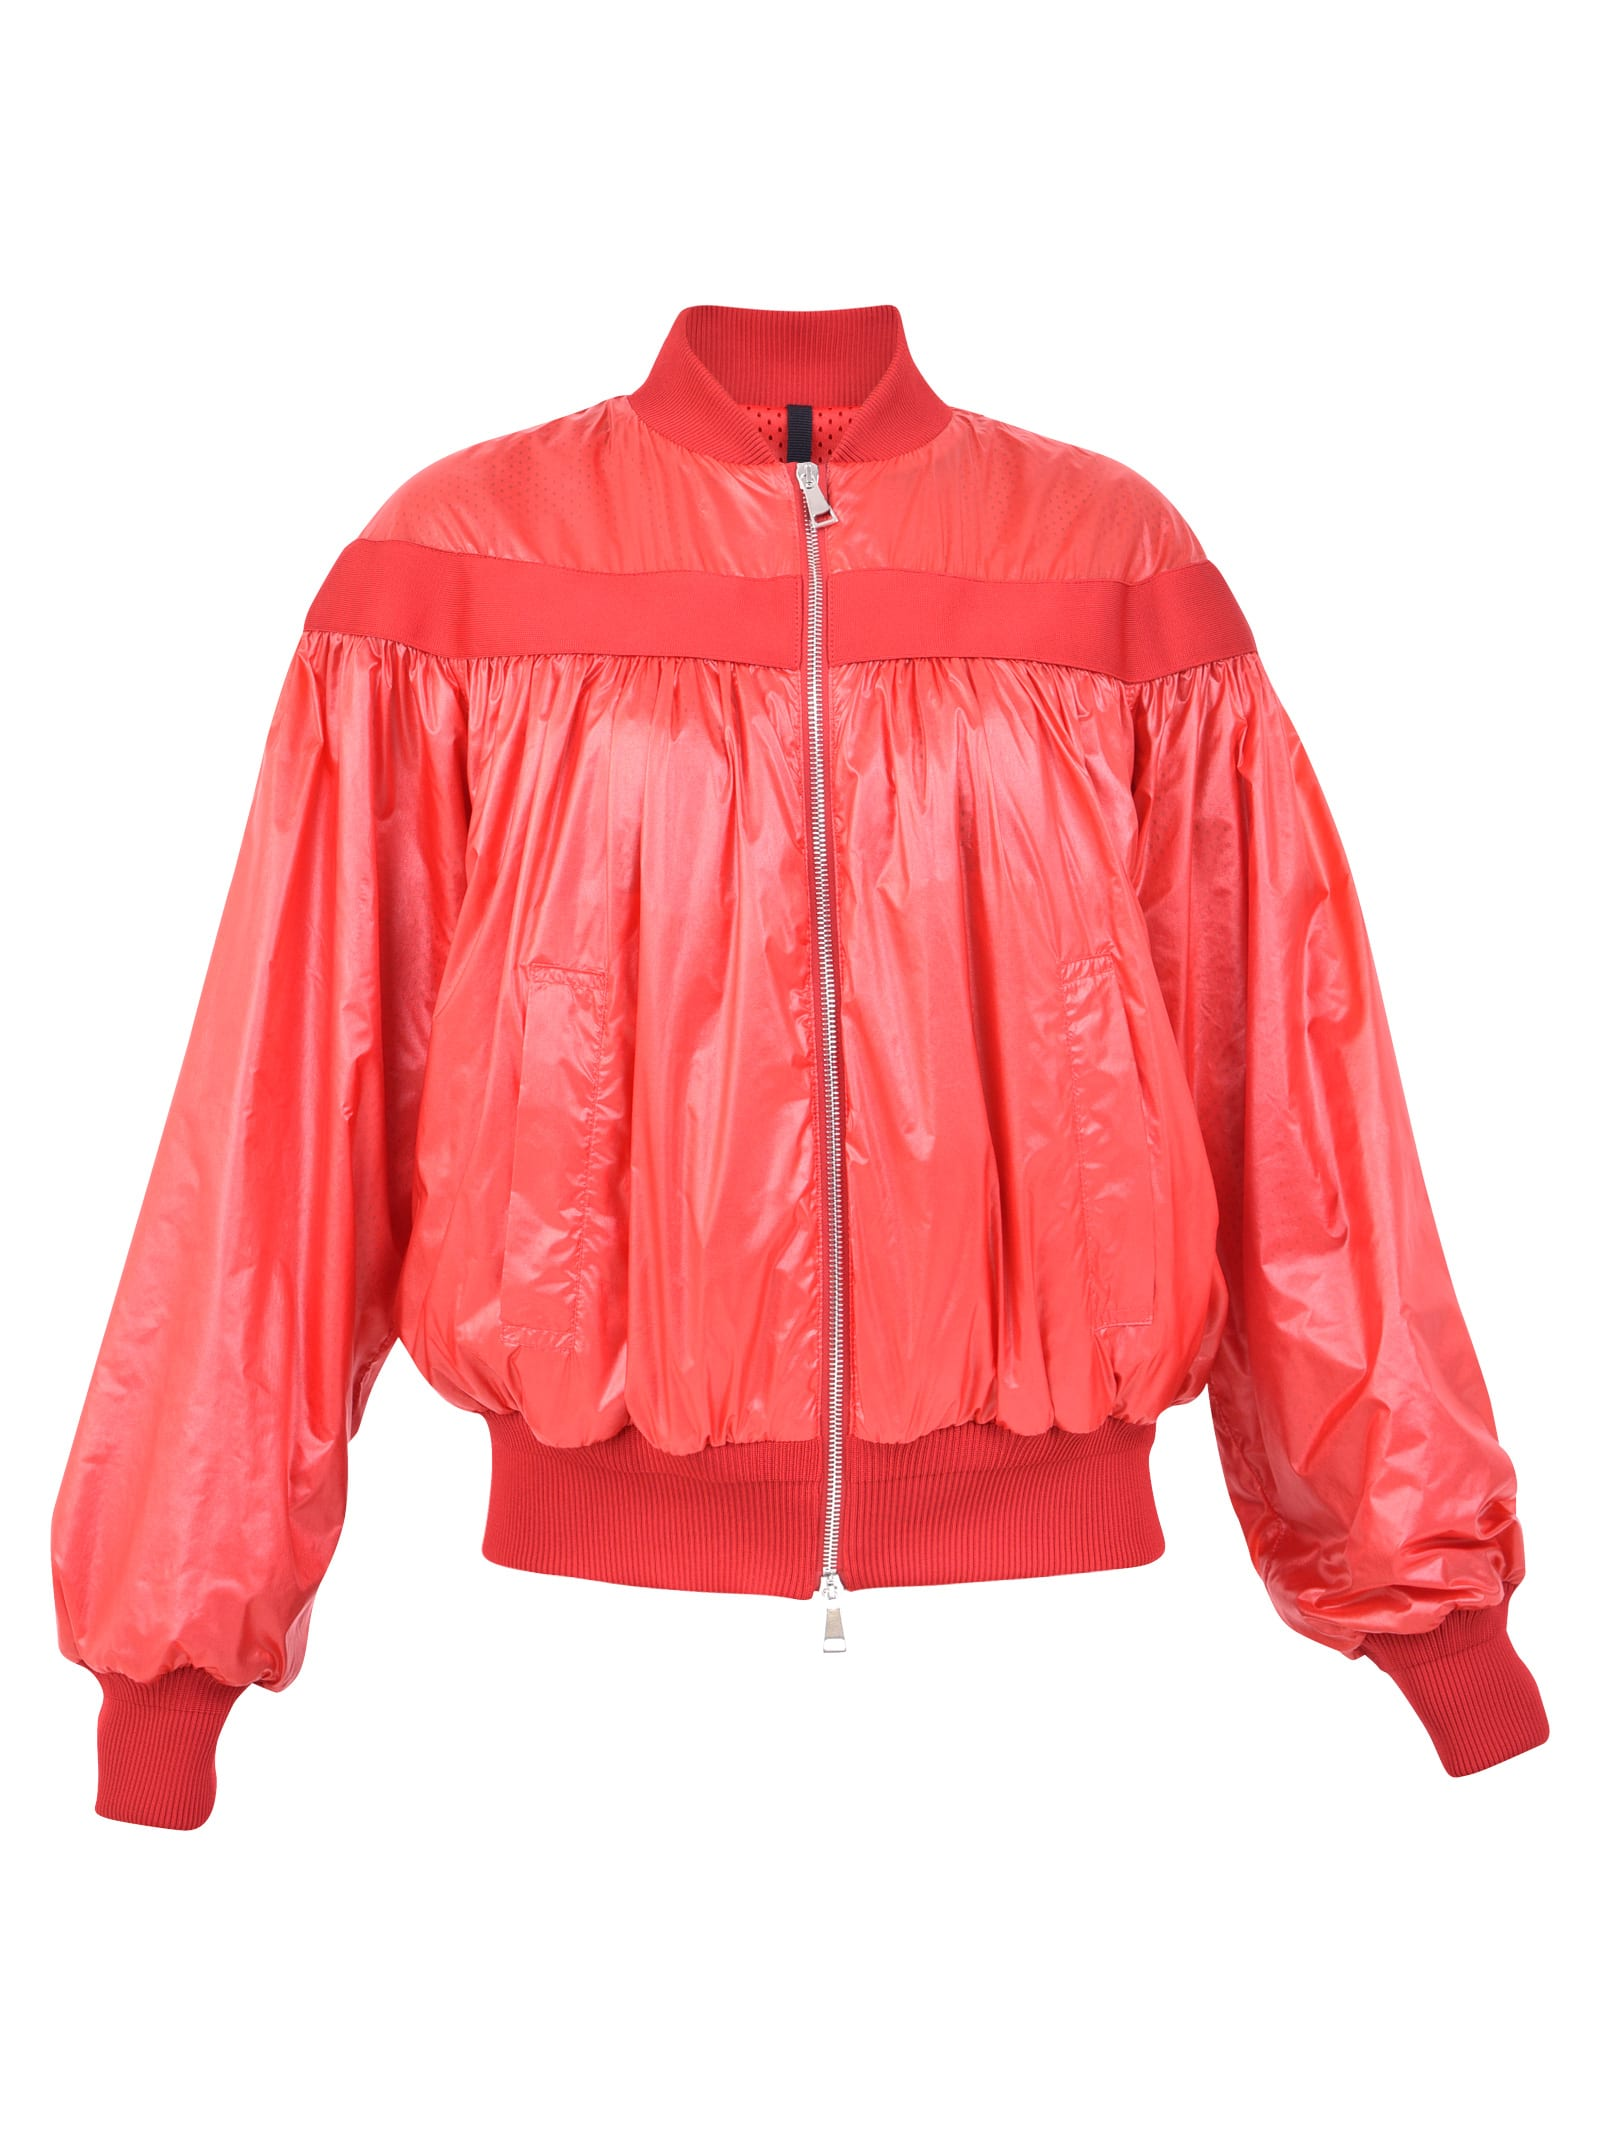 Moncler Genius Nassau Jacket